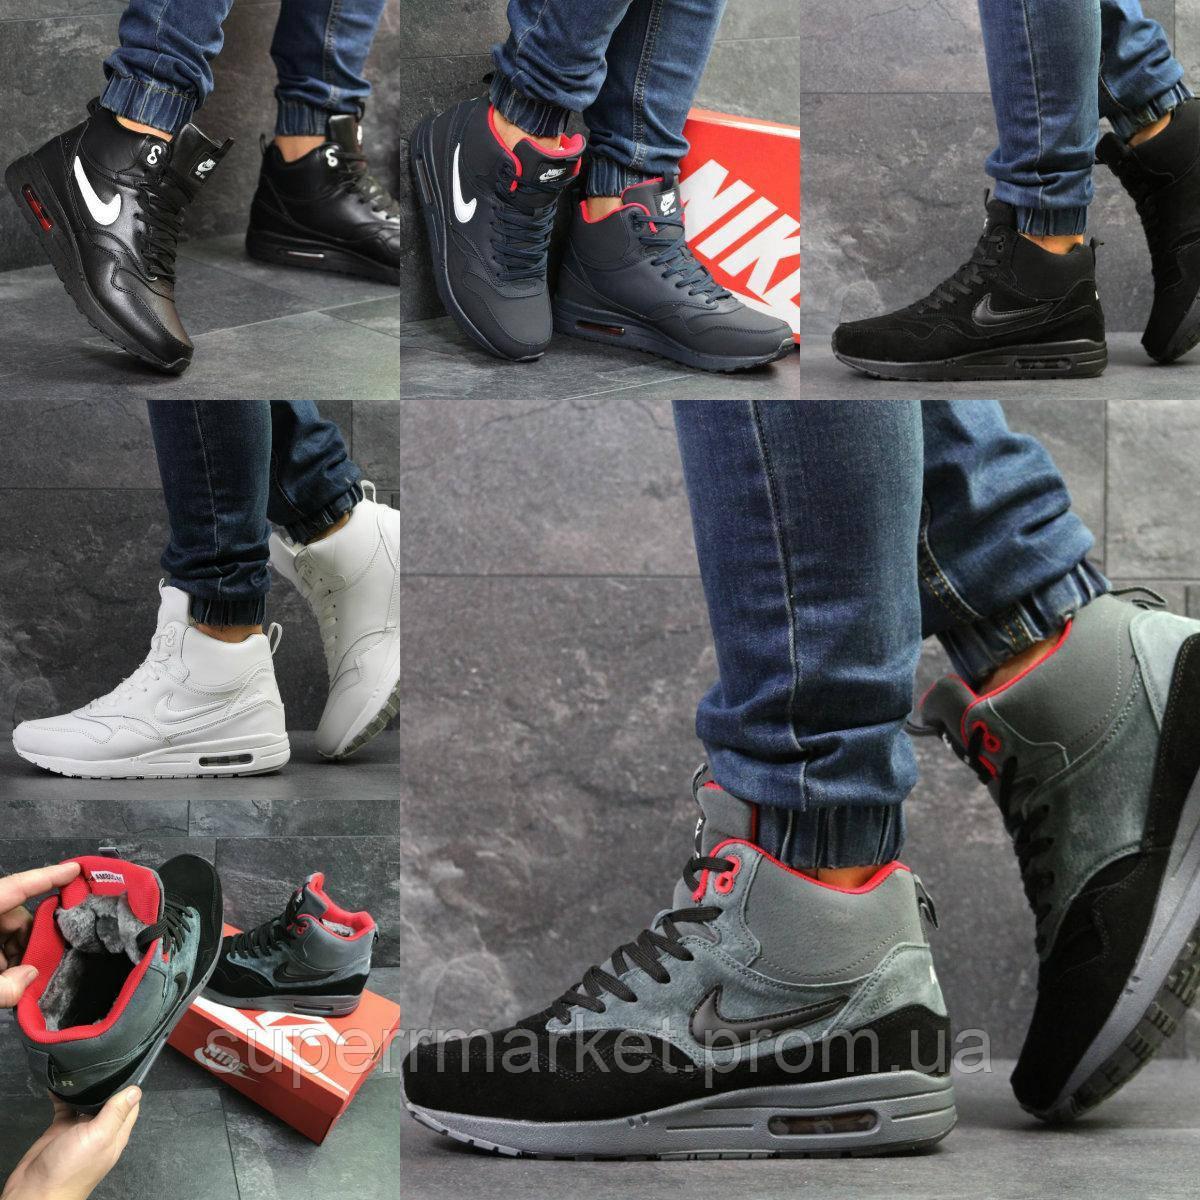 Кроссовки Nike Air Max 87  зима